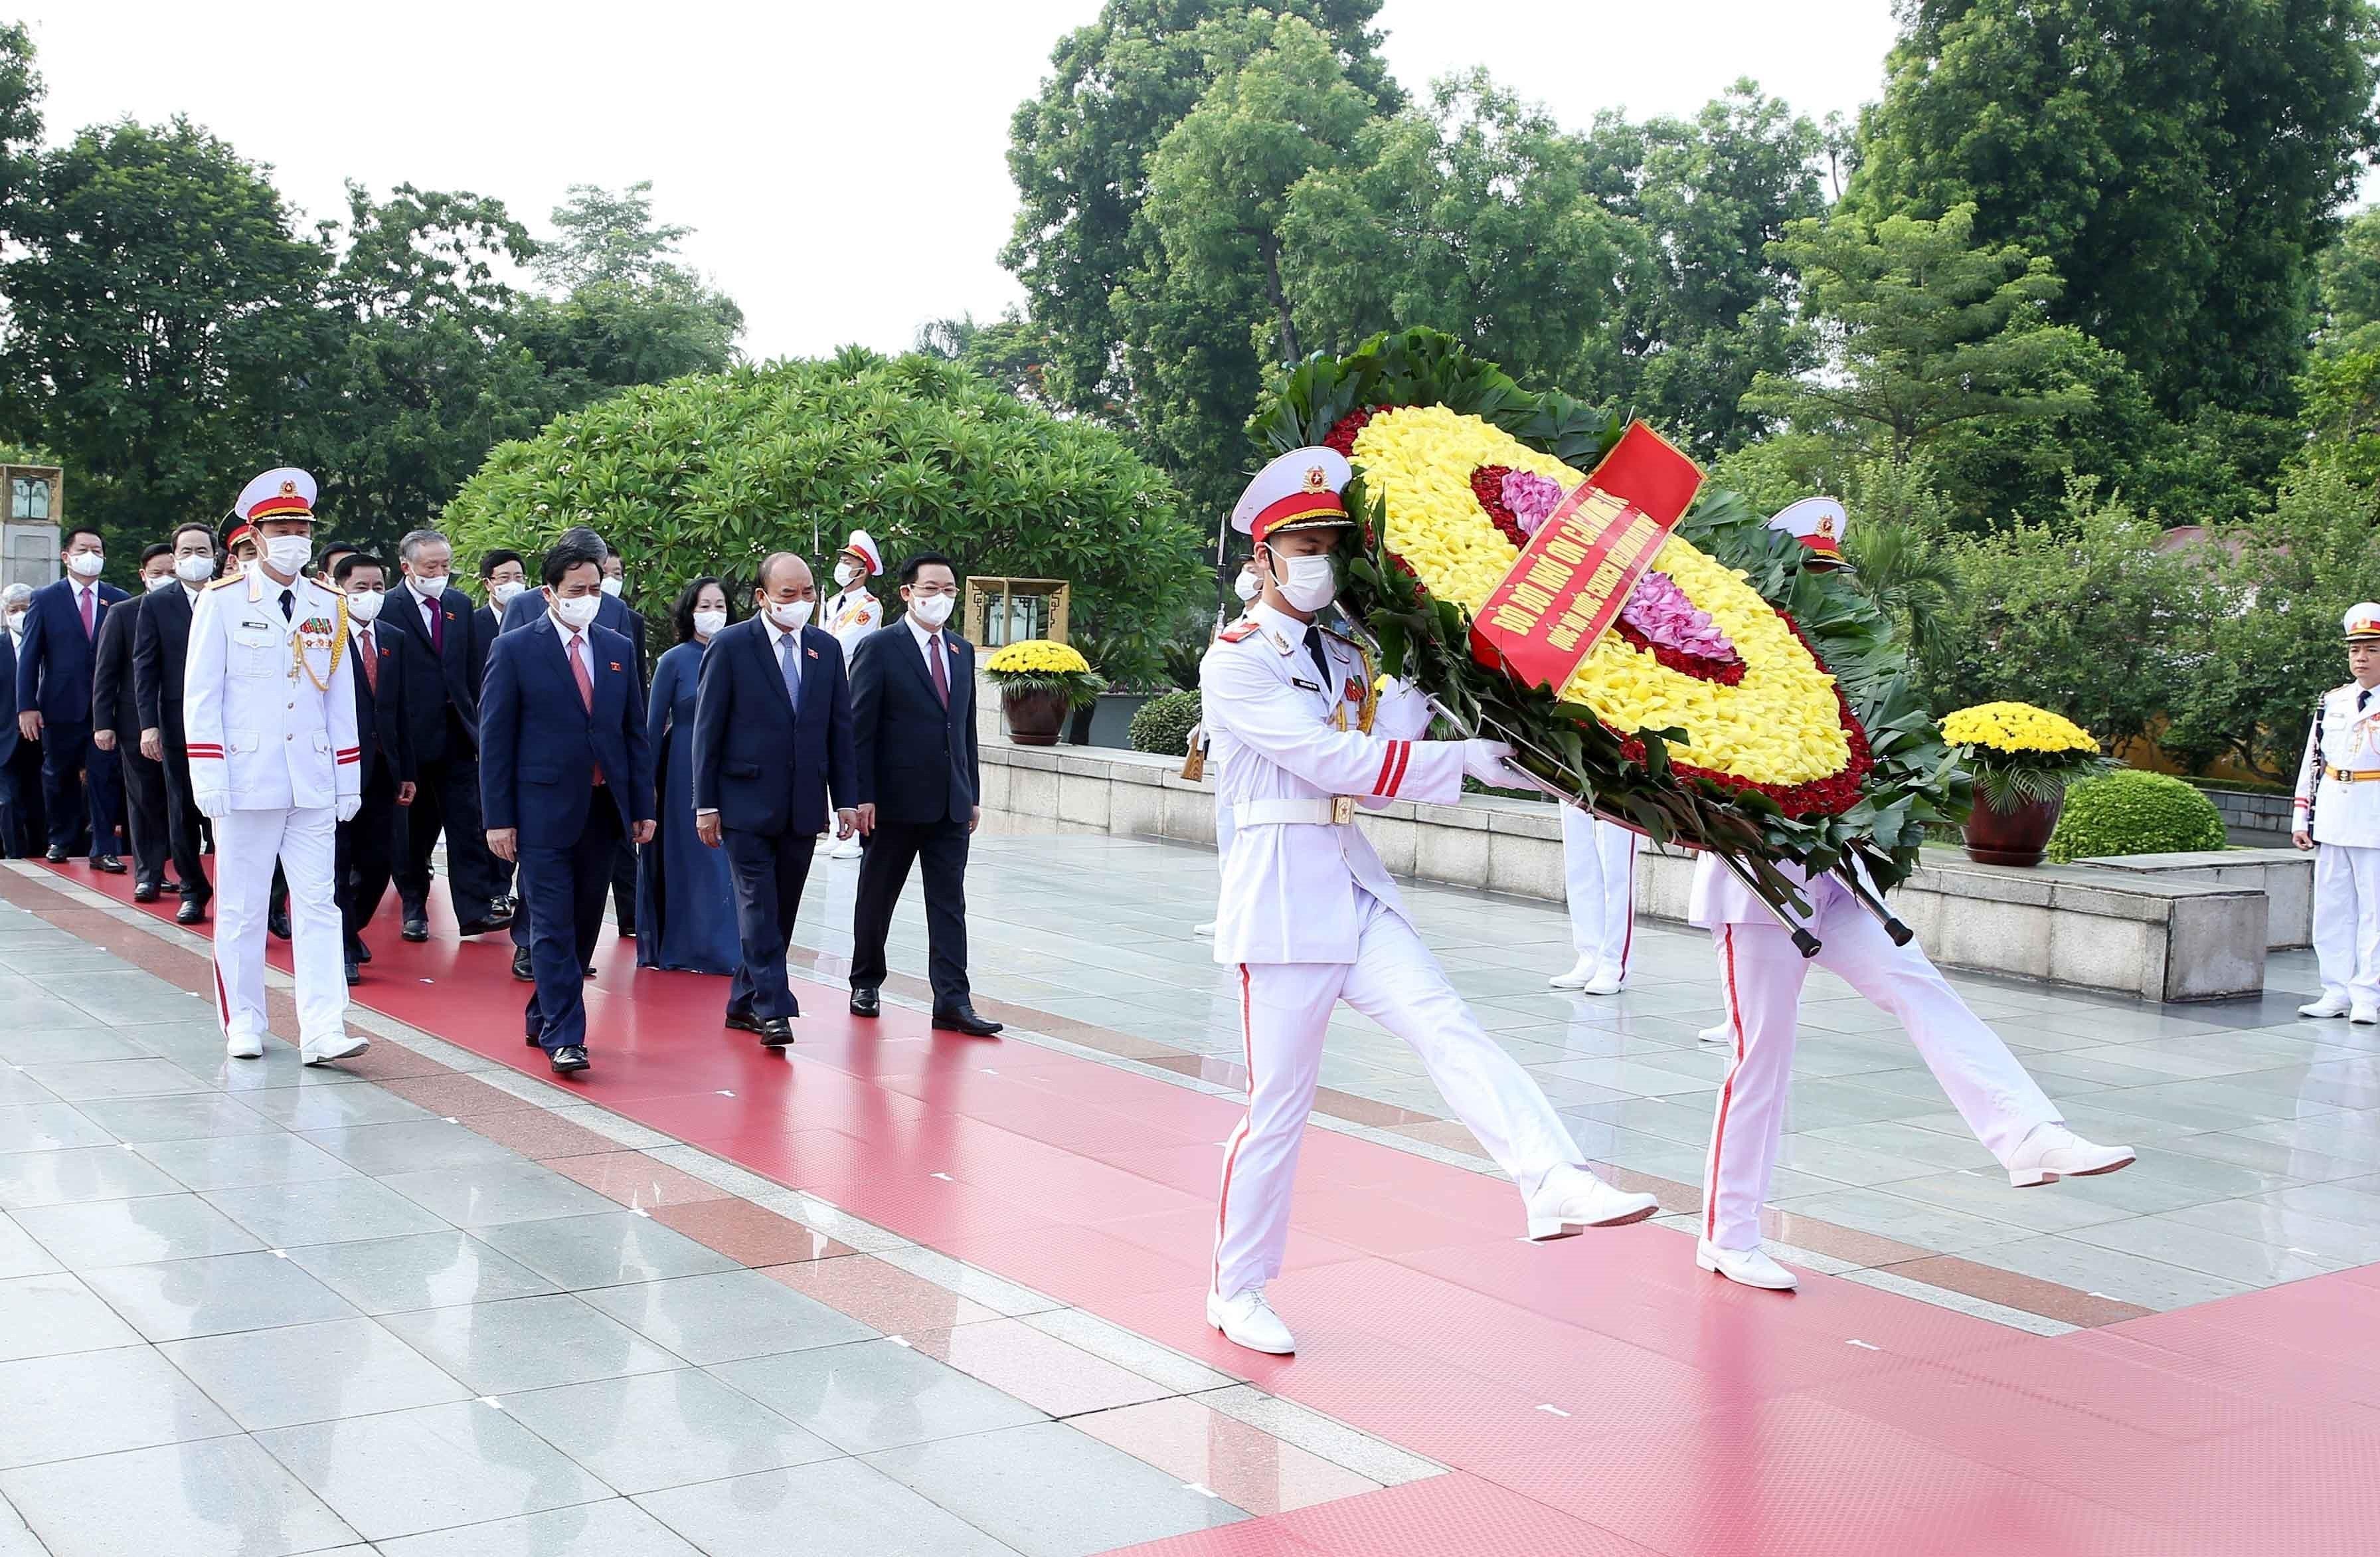 [Photo] Dai bieu Quoc hoi khoa XV vao Lang vieng Chu tich Ho Chi Minh hinh anh 5